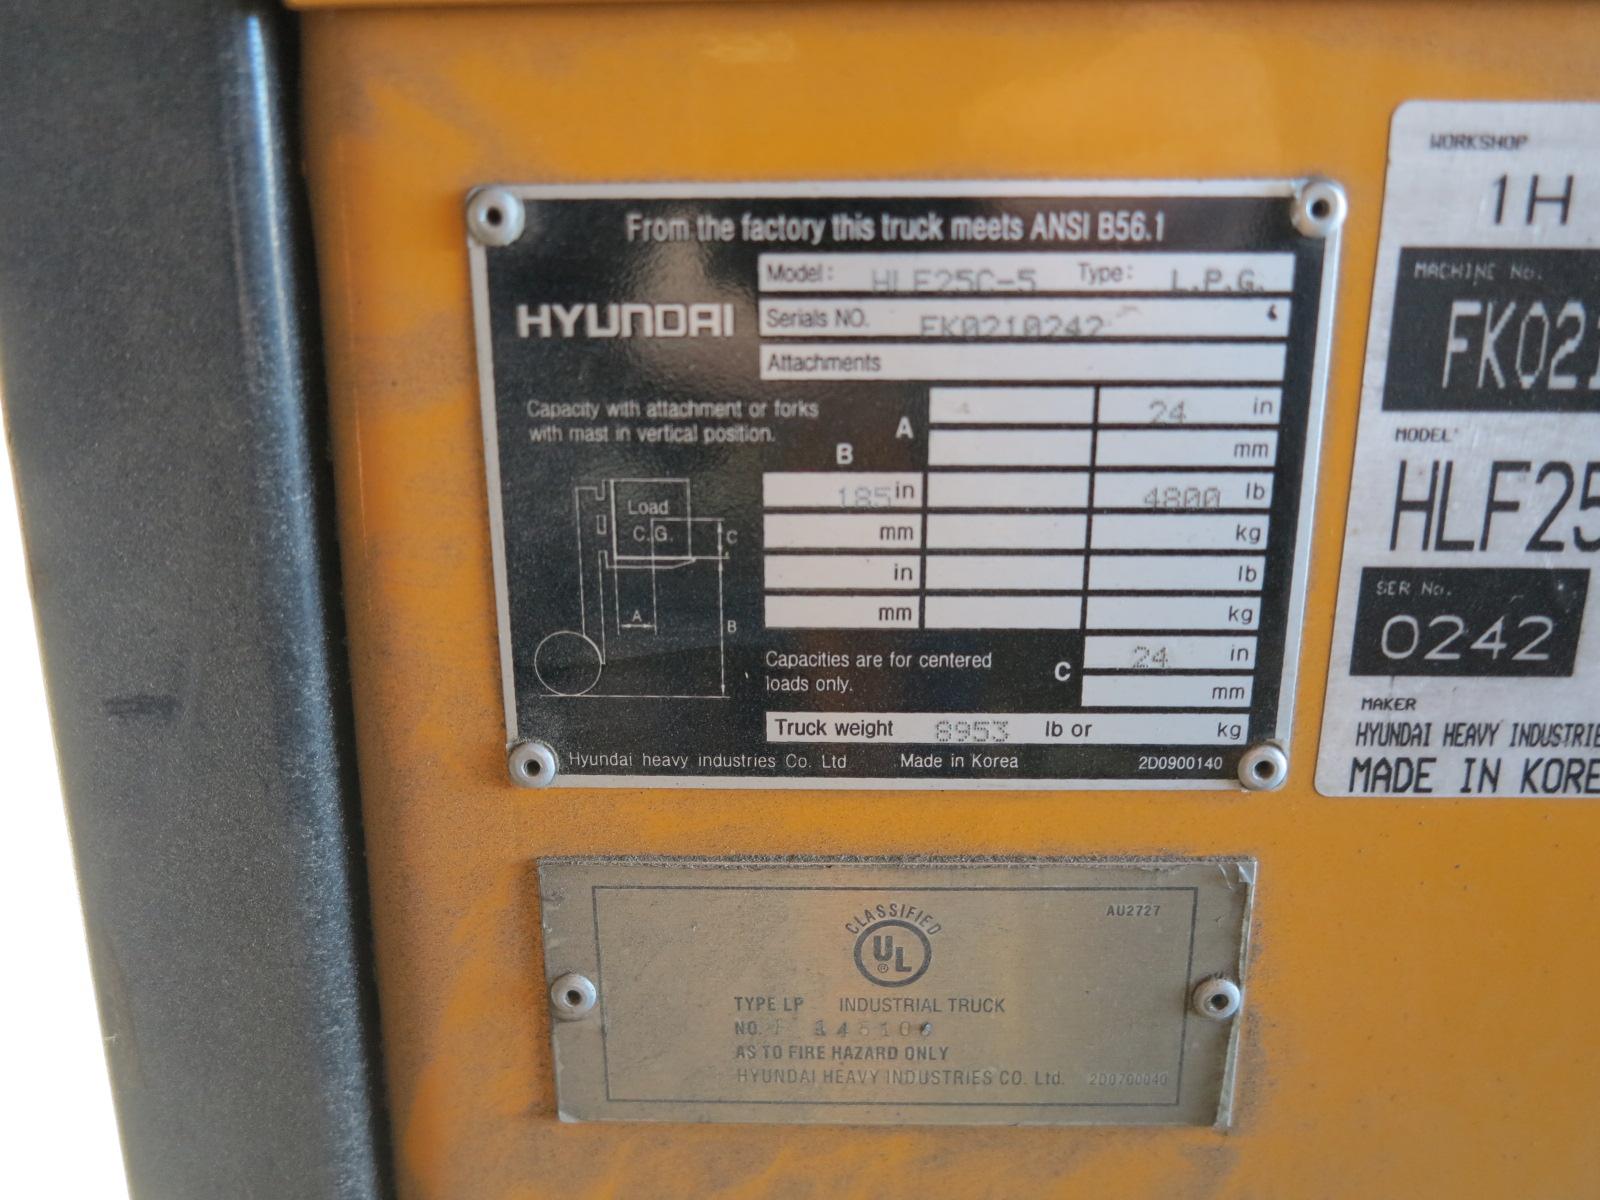 Lot 32 - HYUNDAI 4,800 LB LP FORKLIFT, MODEL HLE-25C-5, S/N EK0210242, OUT OF SERVICE